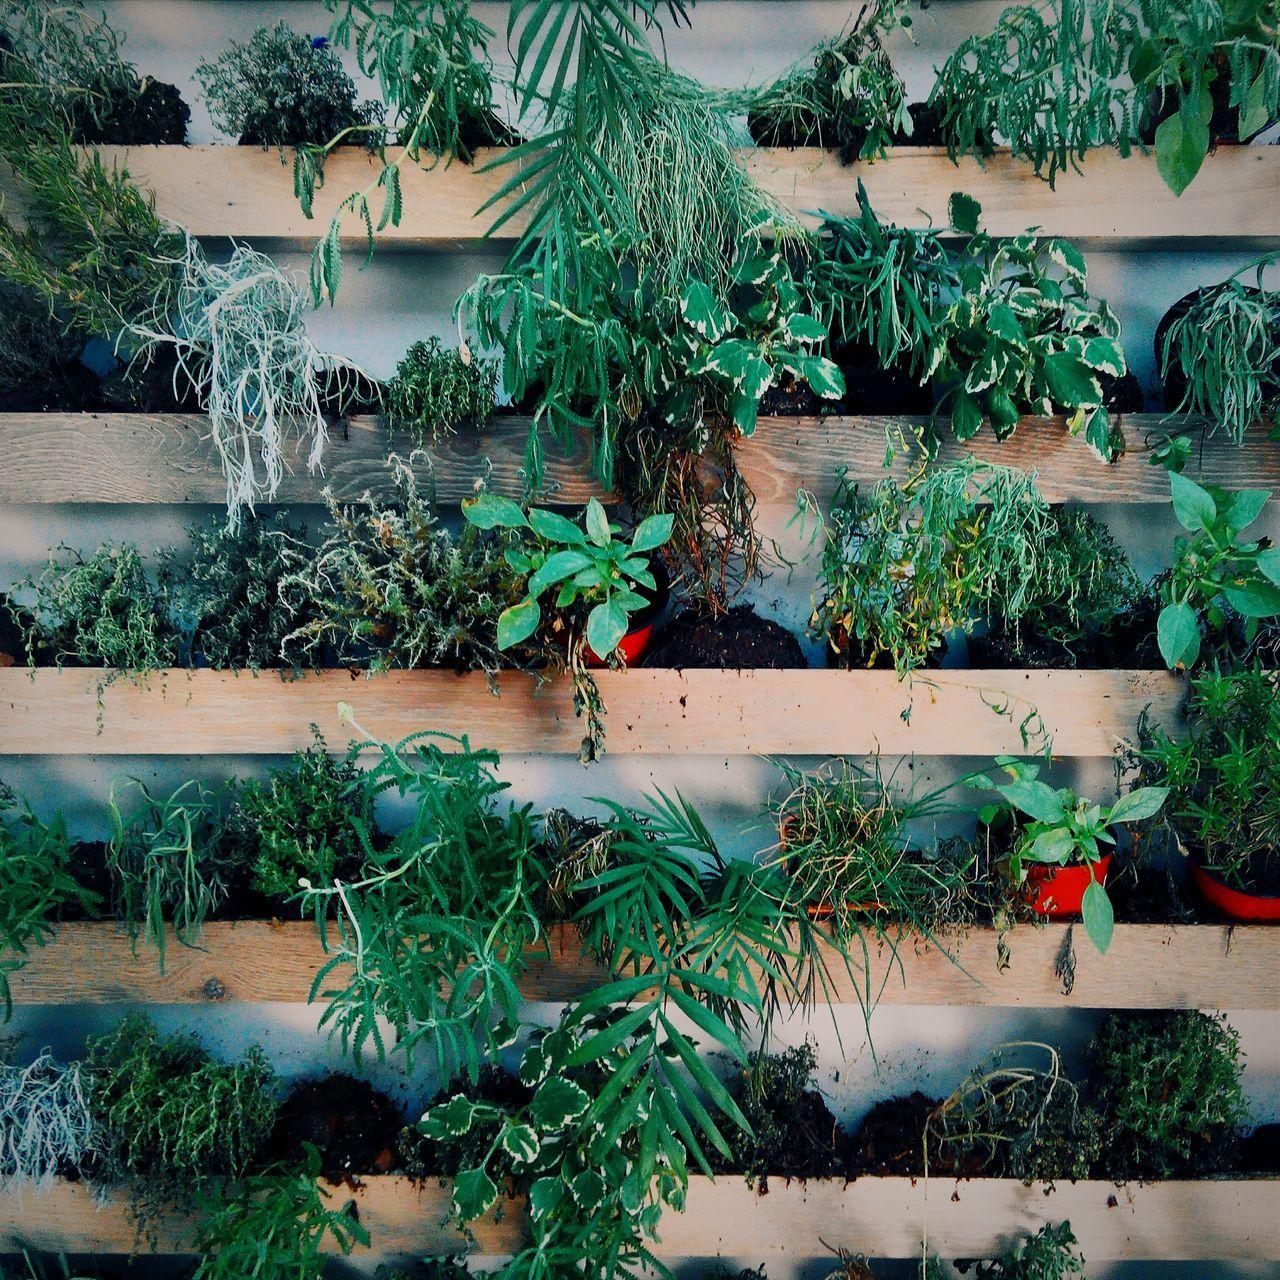 Interior Design Interior Architecture Interior Interior Decorating Plants Tomillo Aromaticherbs Aromatic Herb